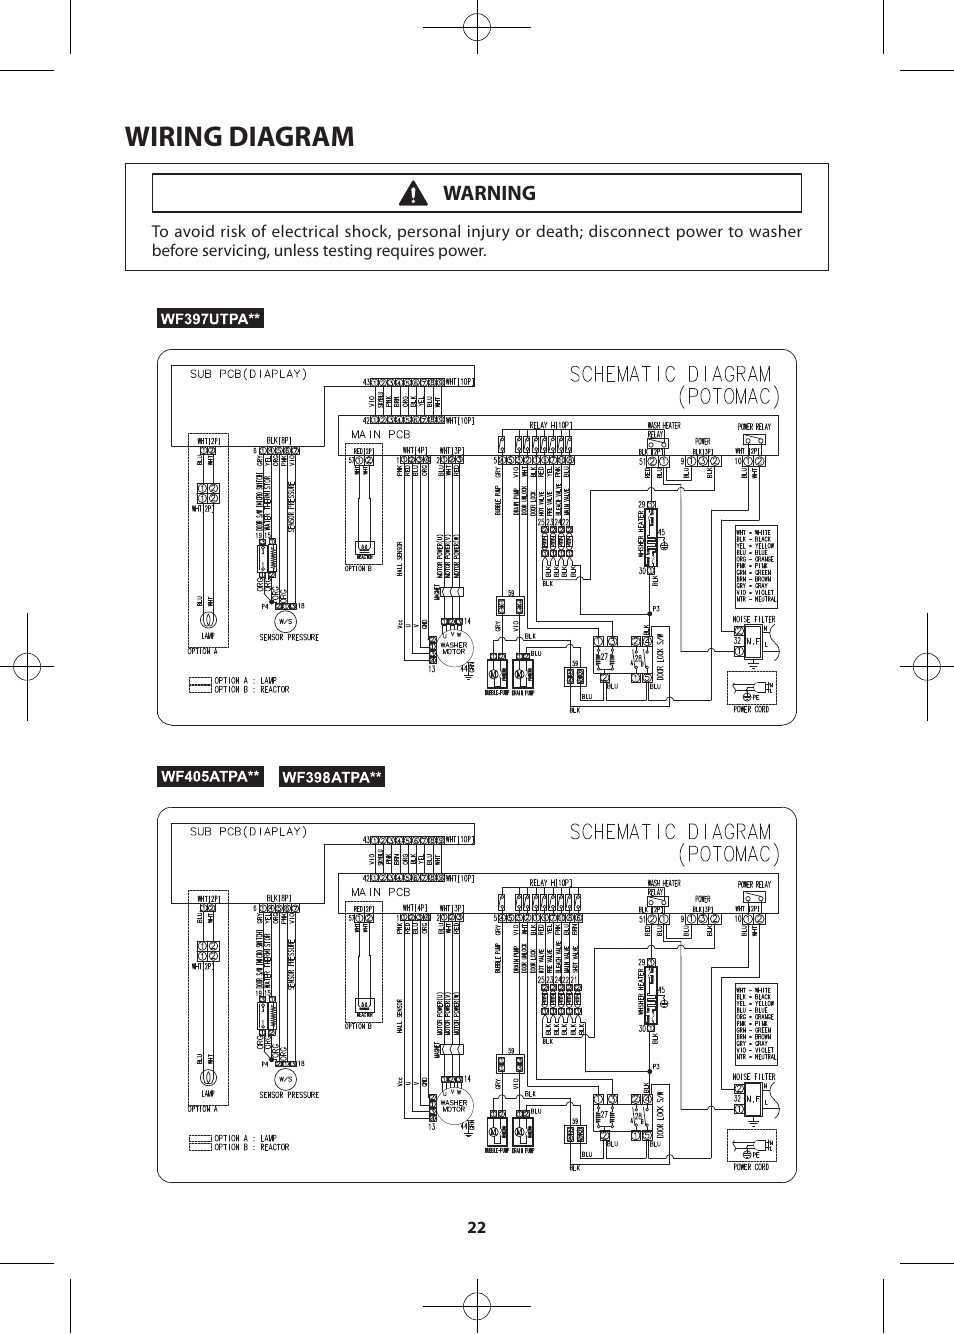 medium resolution of wiring diagram warning samsung wf405atpasu a2 user manual page 22 72